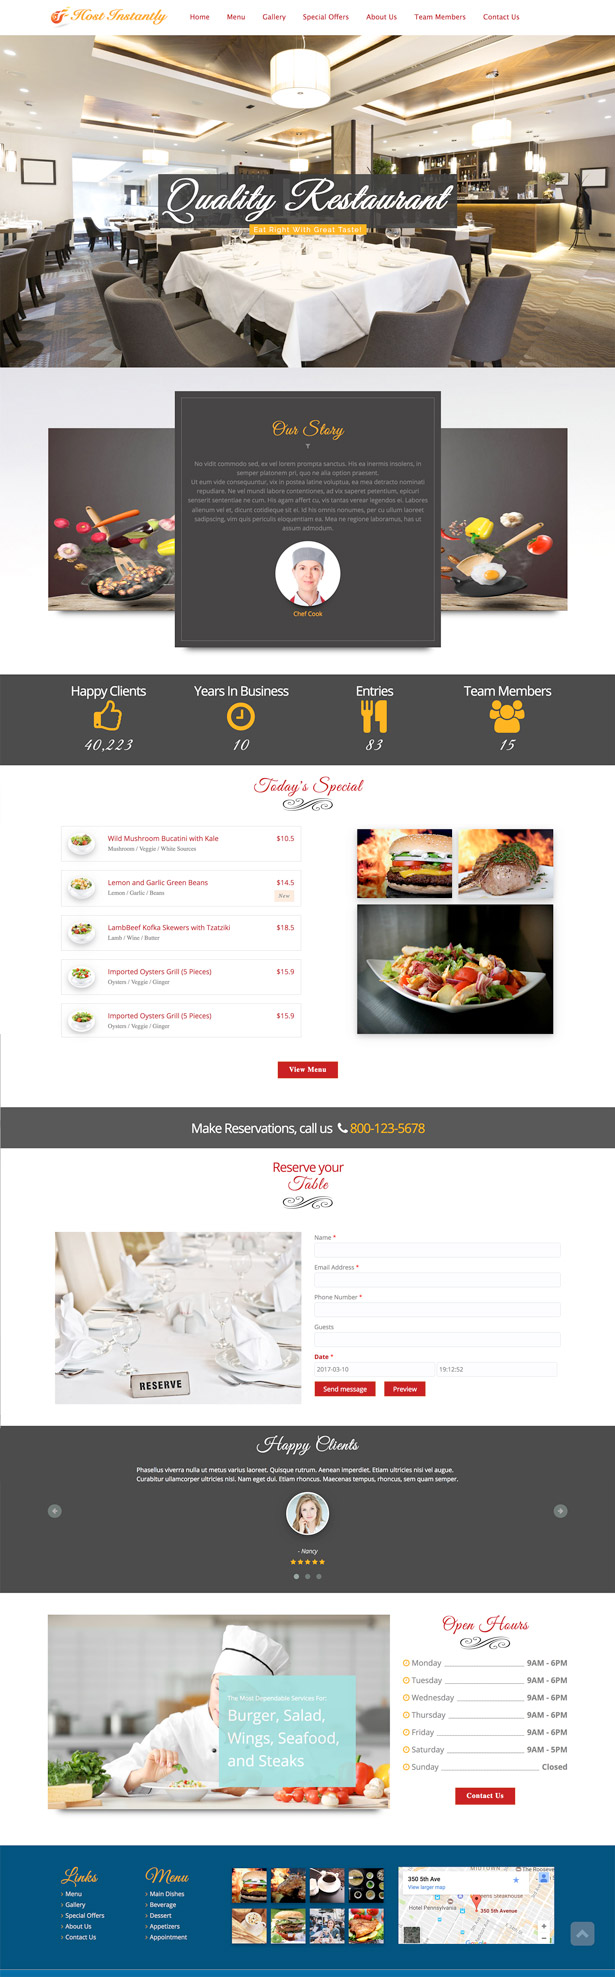 Script Restaurante - Restaurante Responsivo Drag & Drop Website Builder